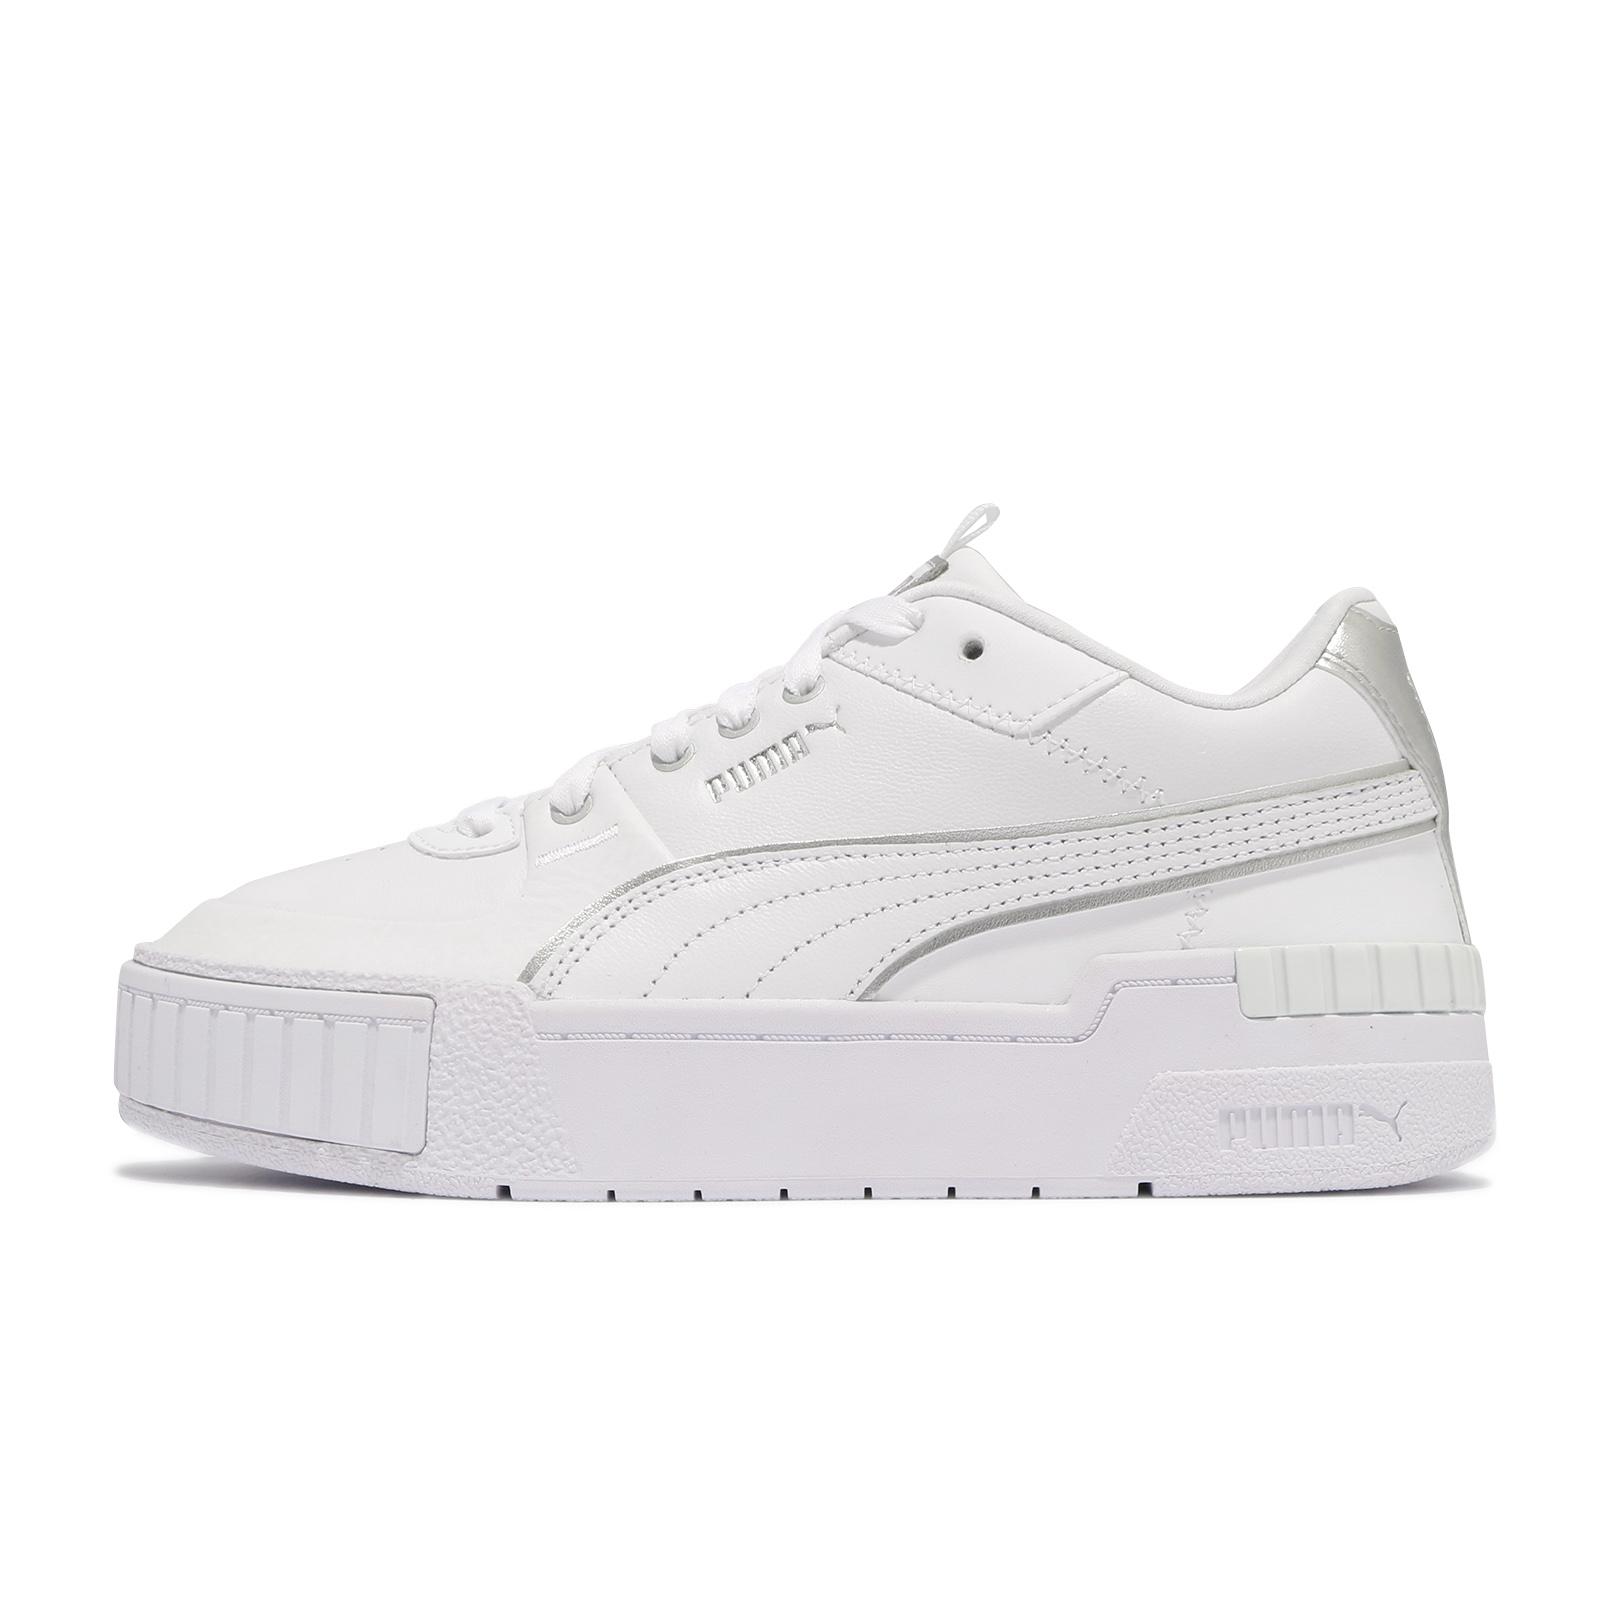 Puma 休閒鞋 Cali Sport Wabi-Sabi 女鞋 白 銀 厚底 板鞋 小白鞋【ACS】 37481801